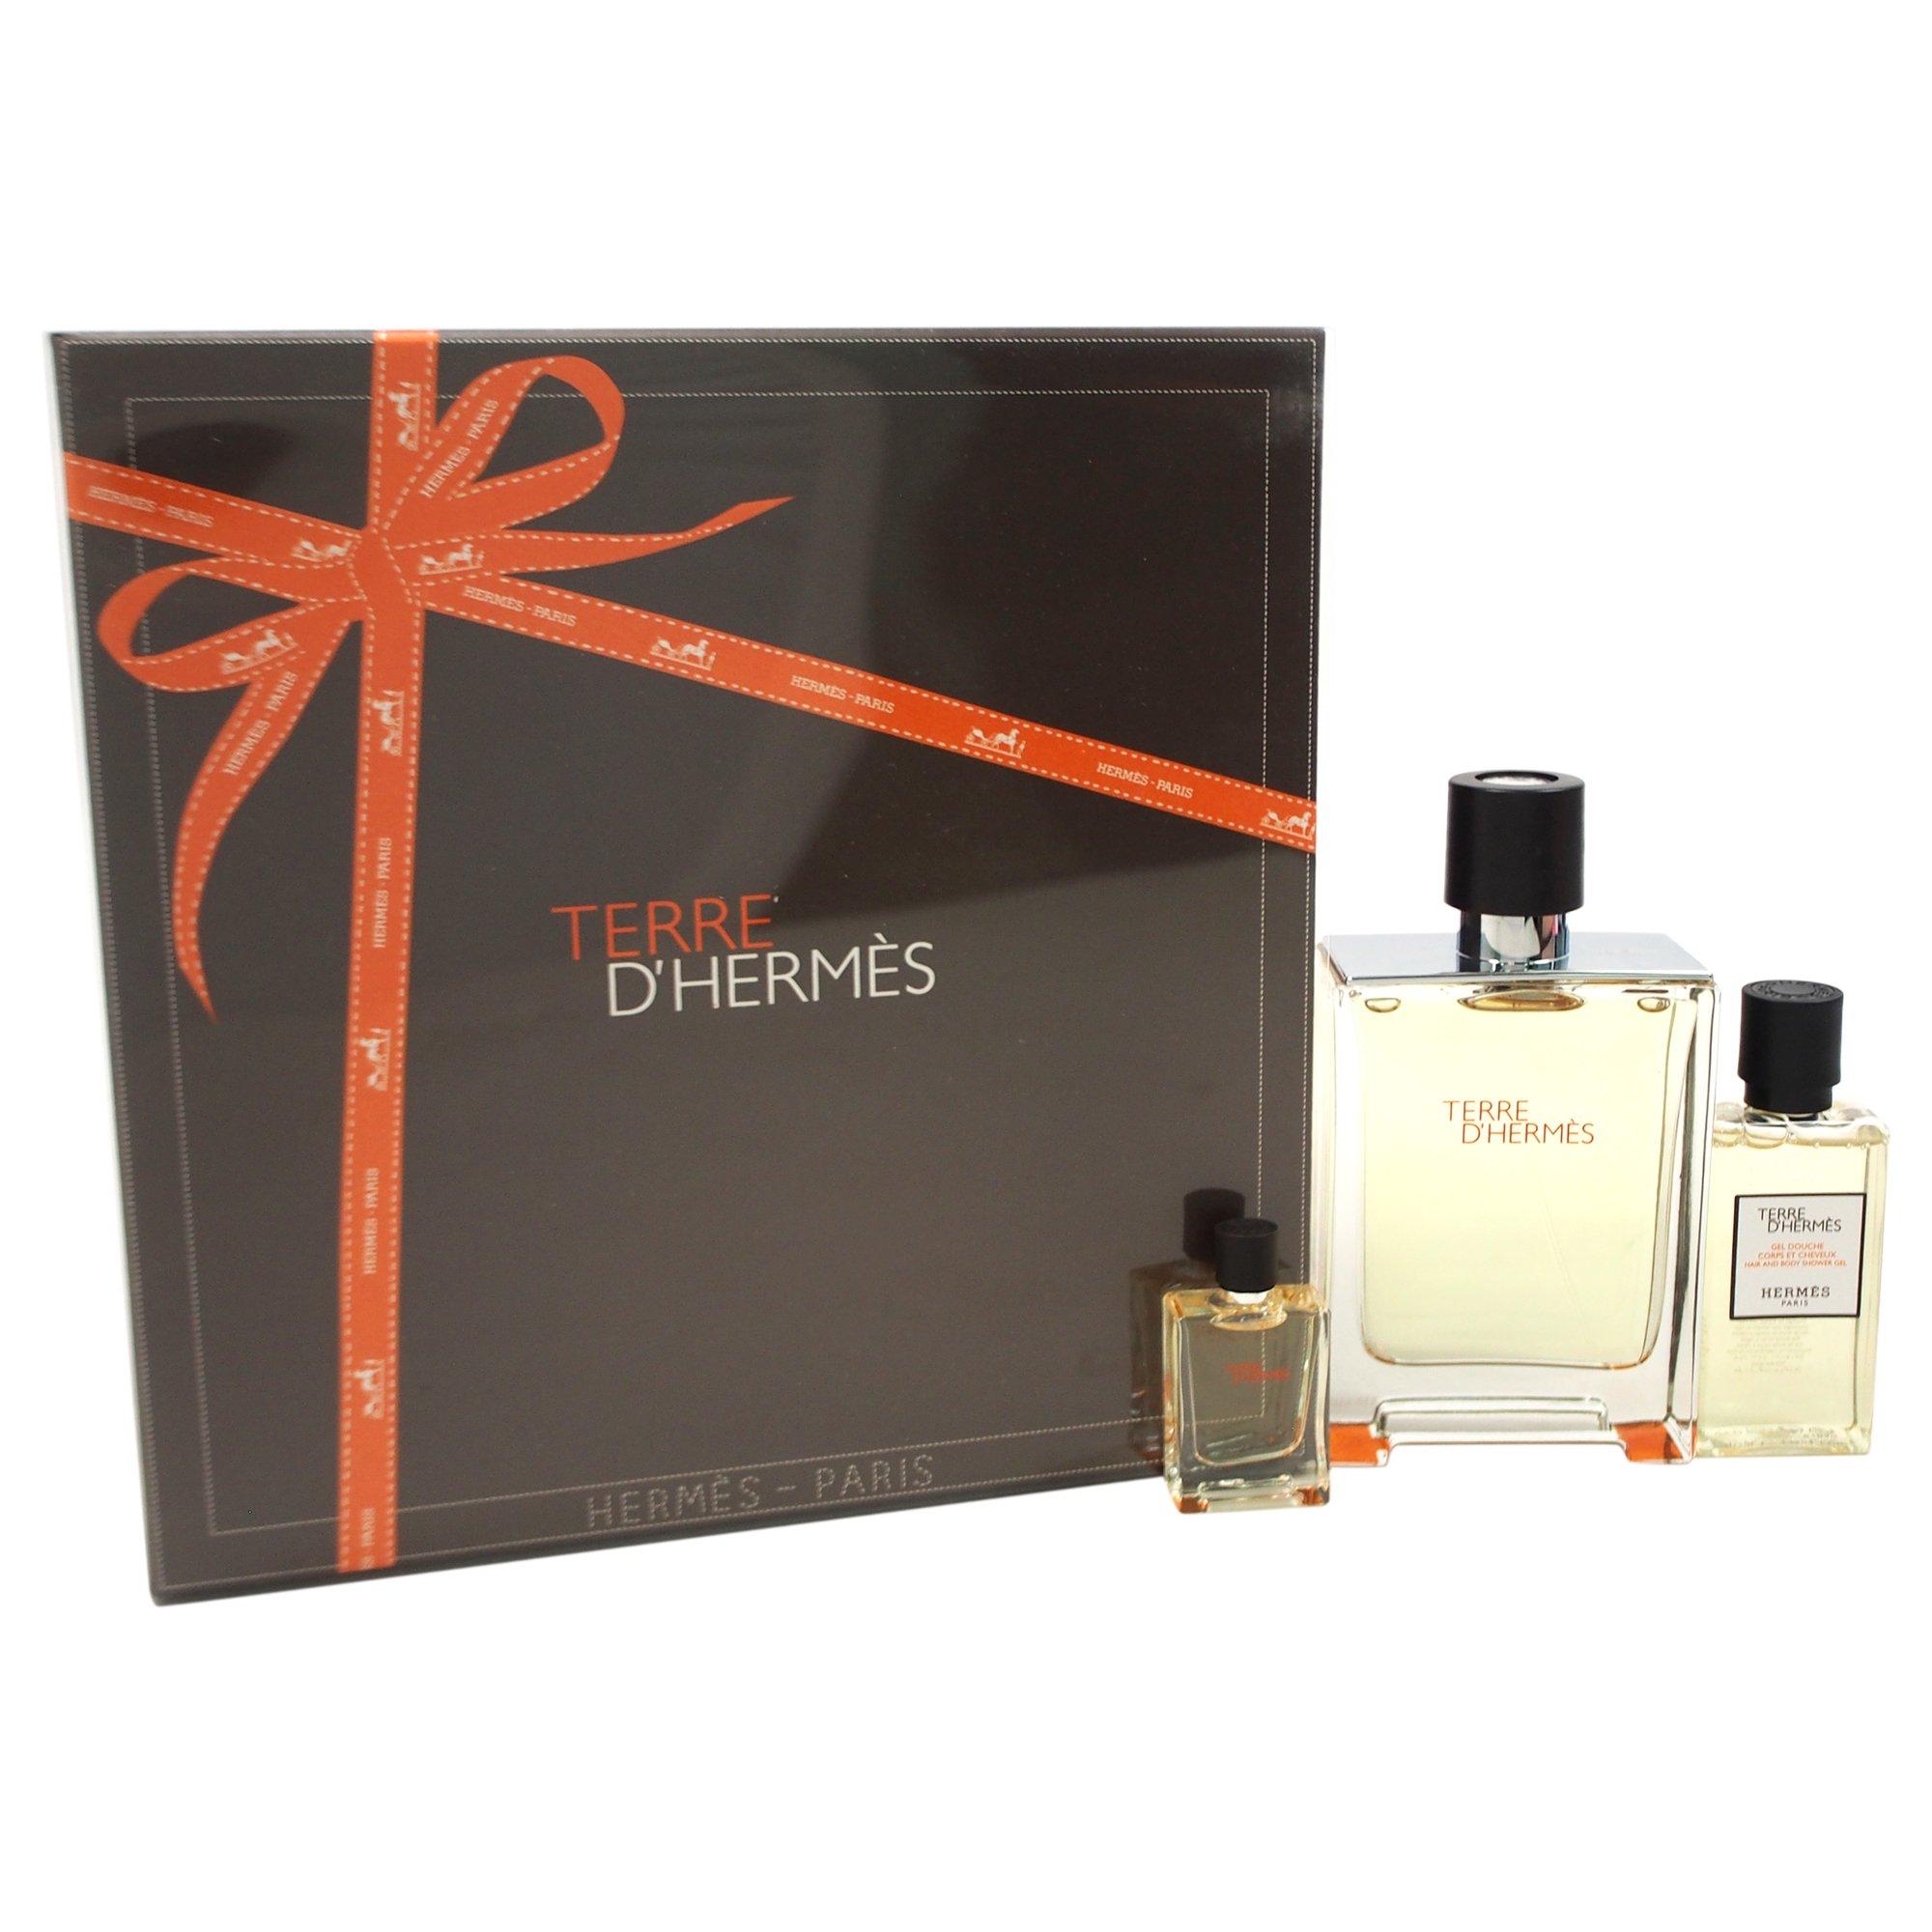 Hermes Terre D'hermes 3 Piece Gift Set for Men